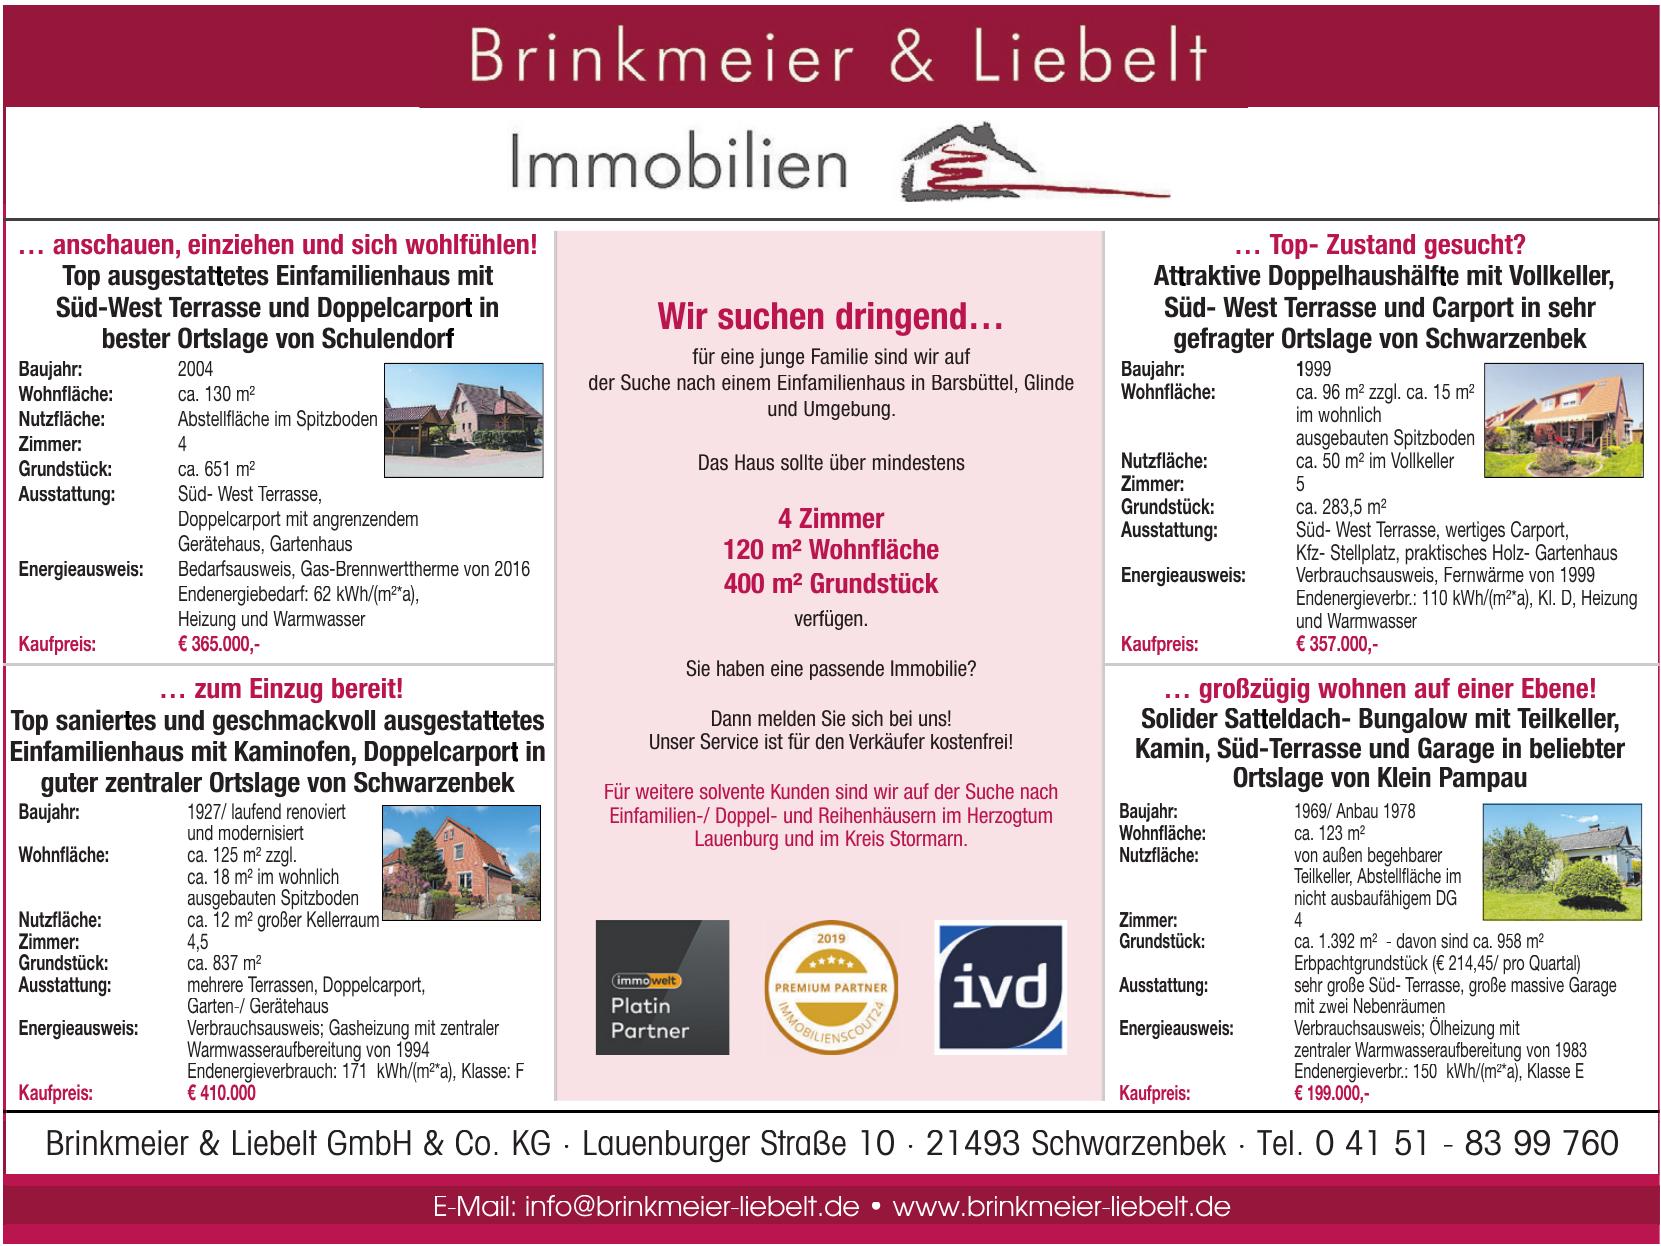 Brinkmeier & Liebelt GmbH & Co. KG